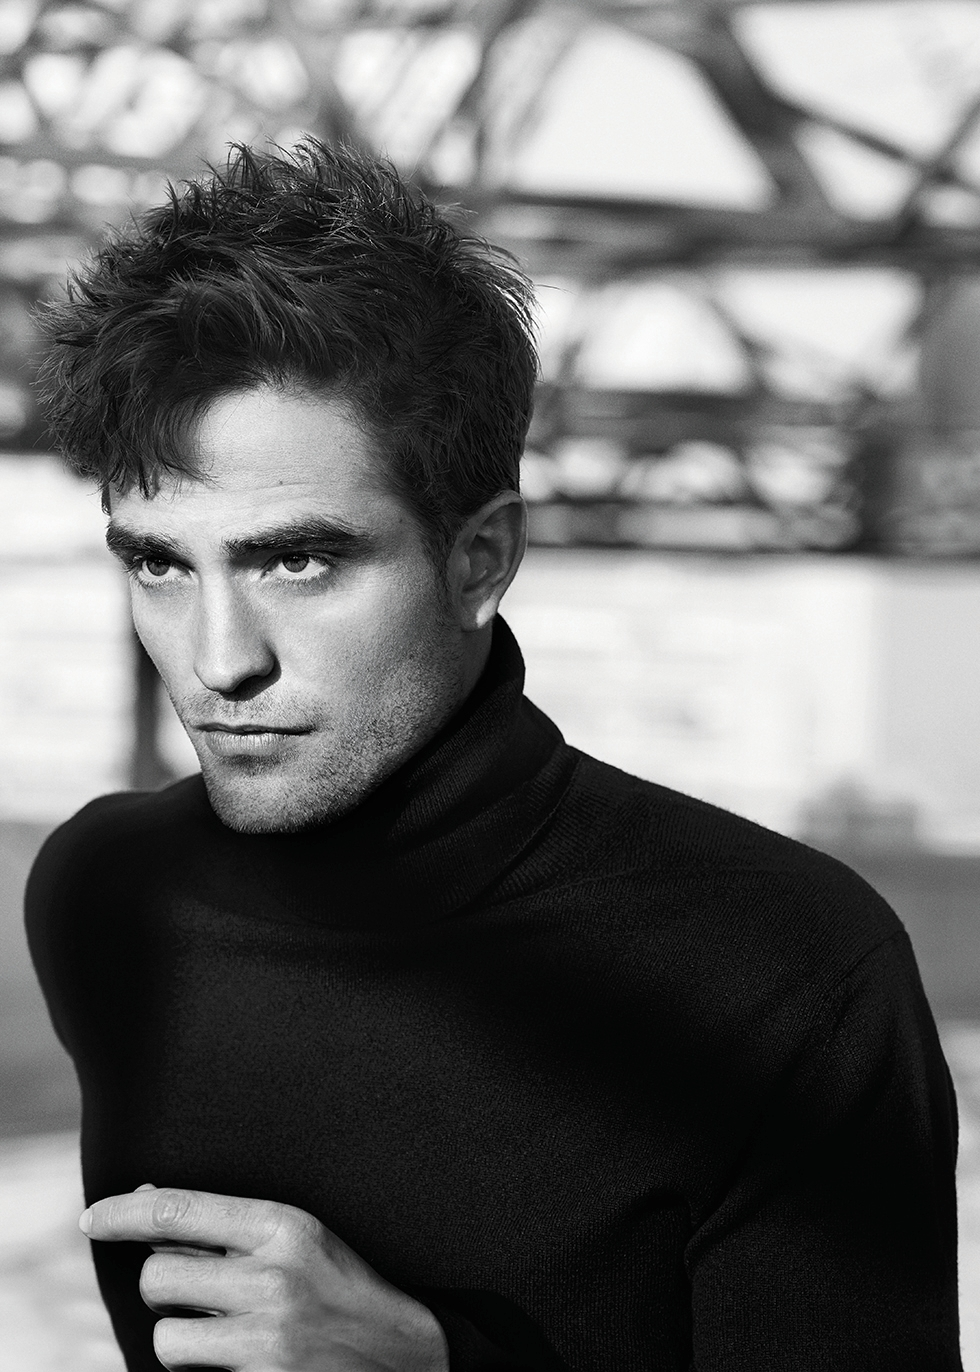 Dior Homme Intense Eau de Parfum 50ml - Dior